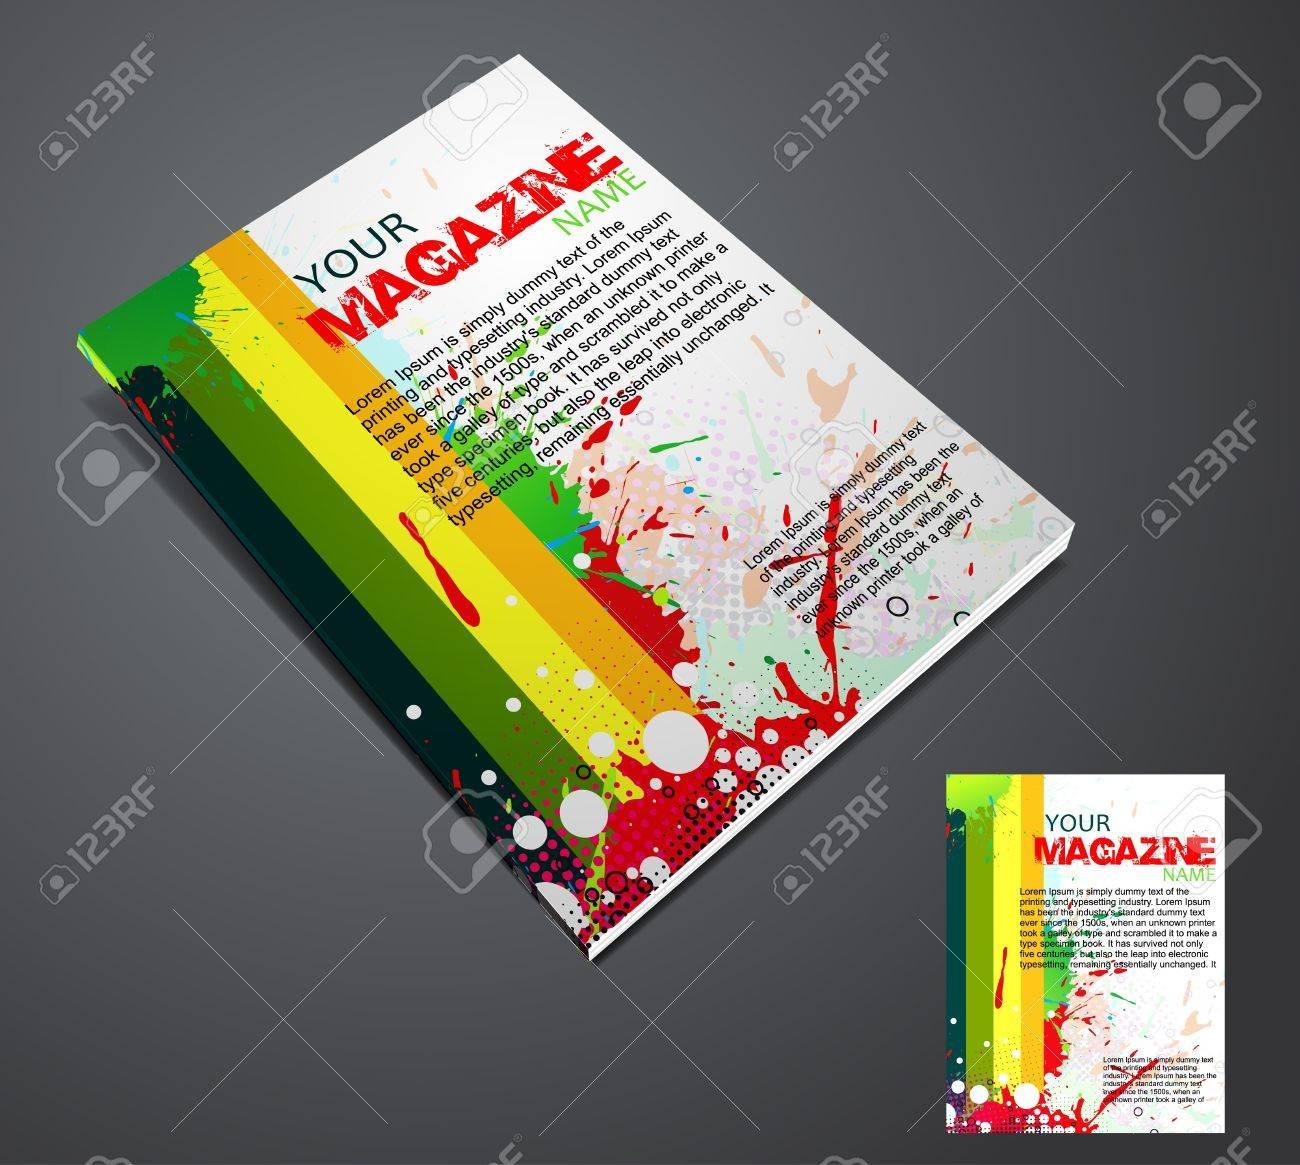 Magazine layout design template. Vector Illustration Stock Vector - 9610864